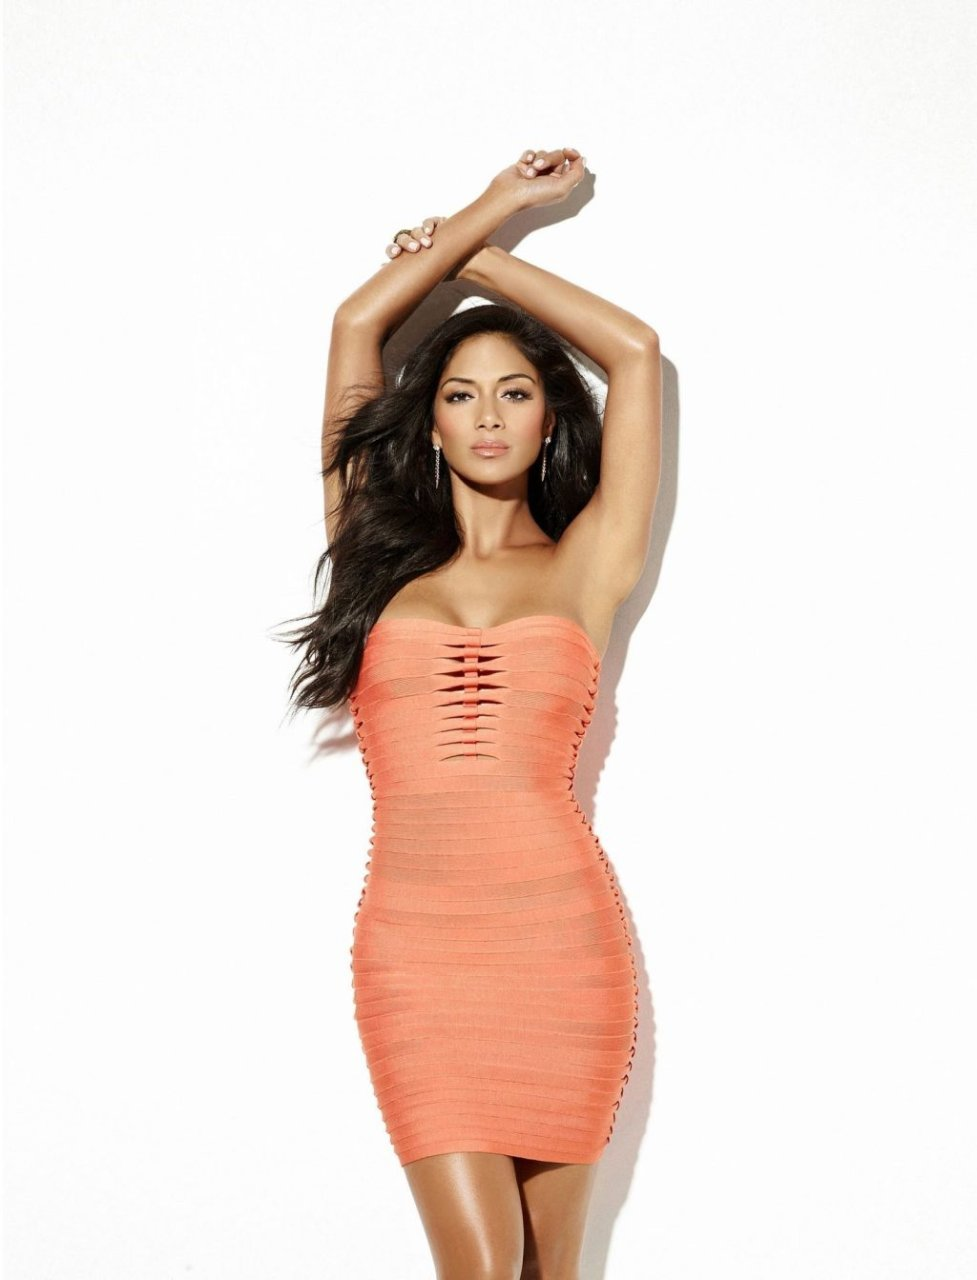 Nicole Scherzinger Sexy (6 Hot Photos)